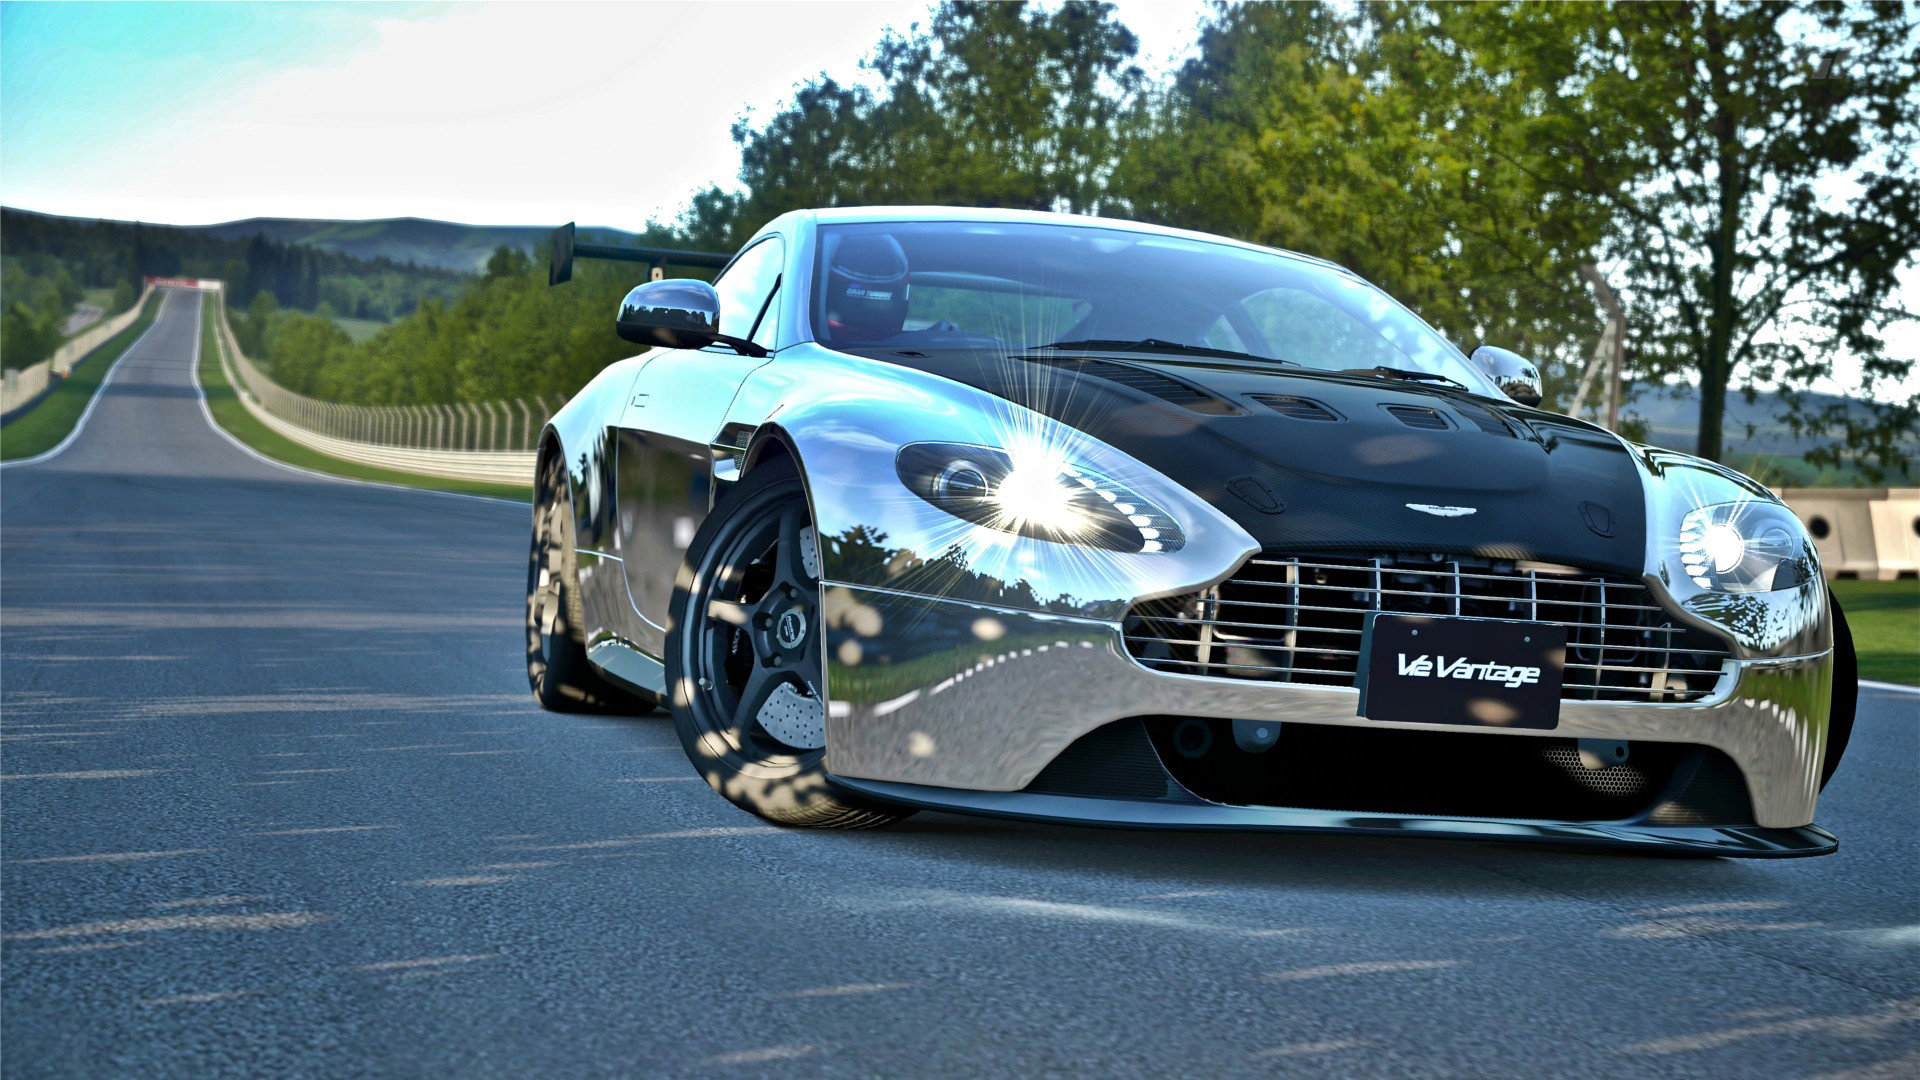 Aston Martin Vantage iPhone Wallpaper HD Free Download